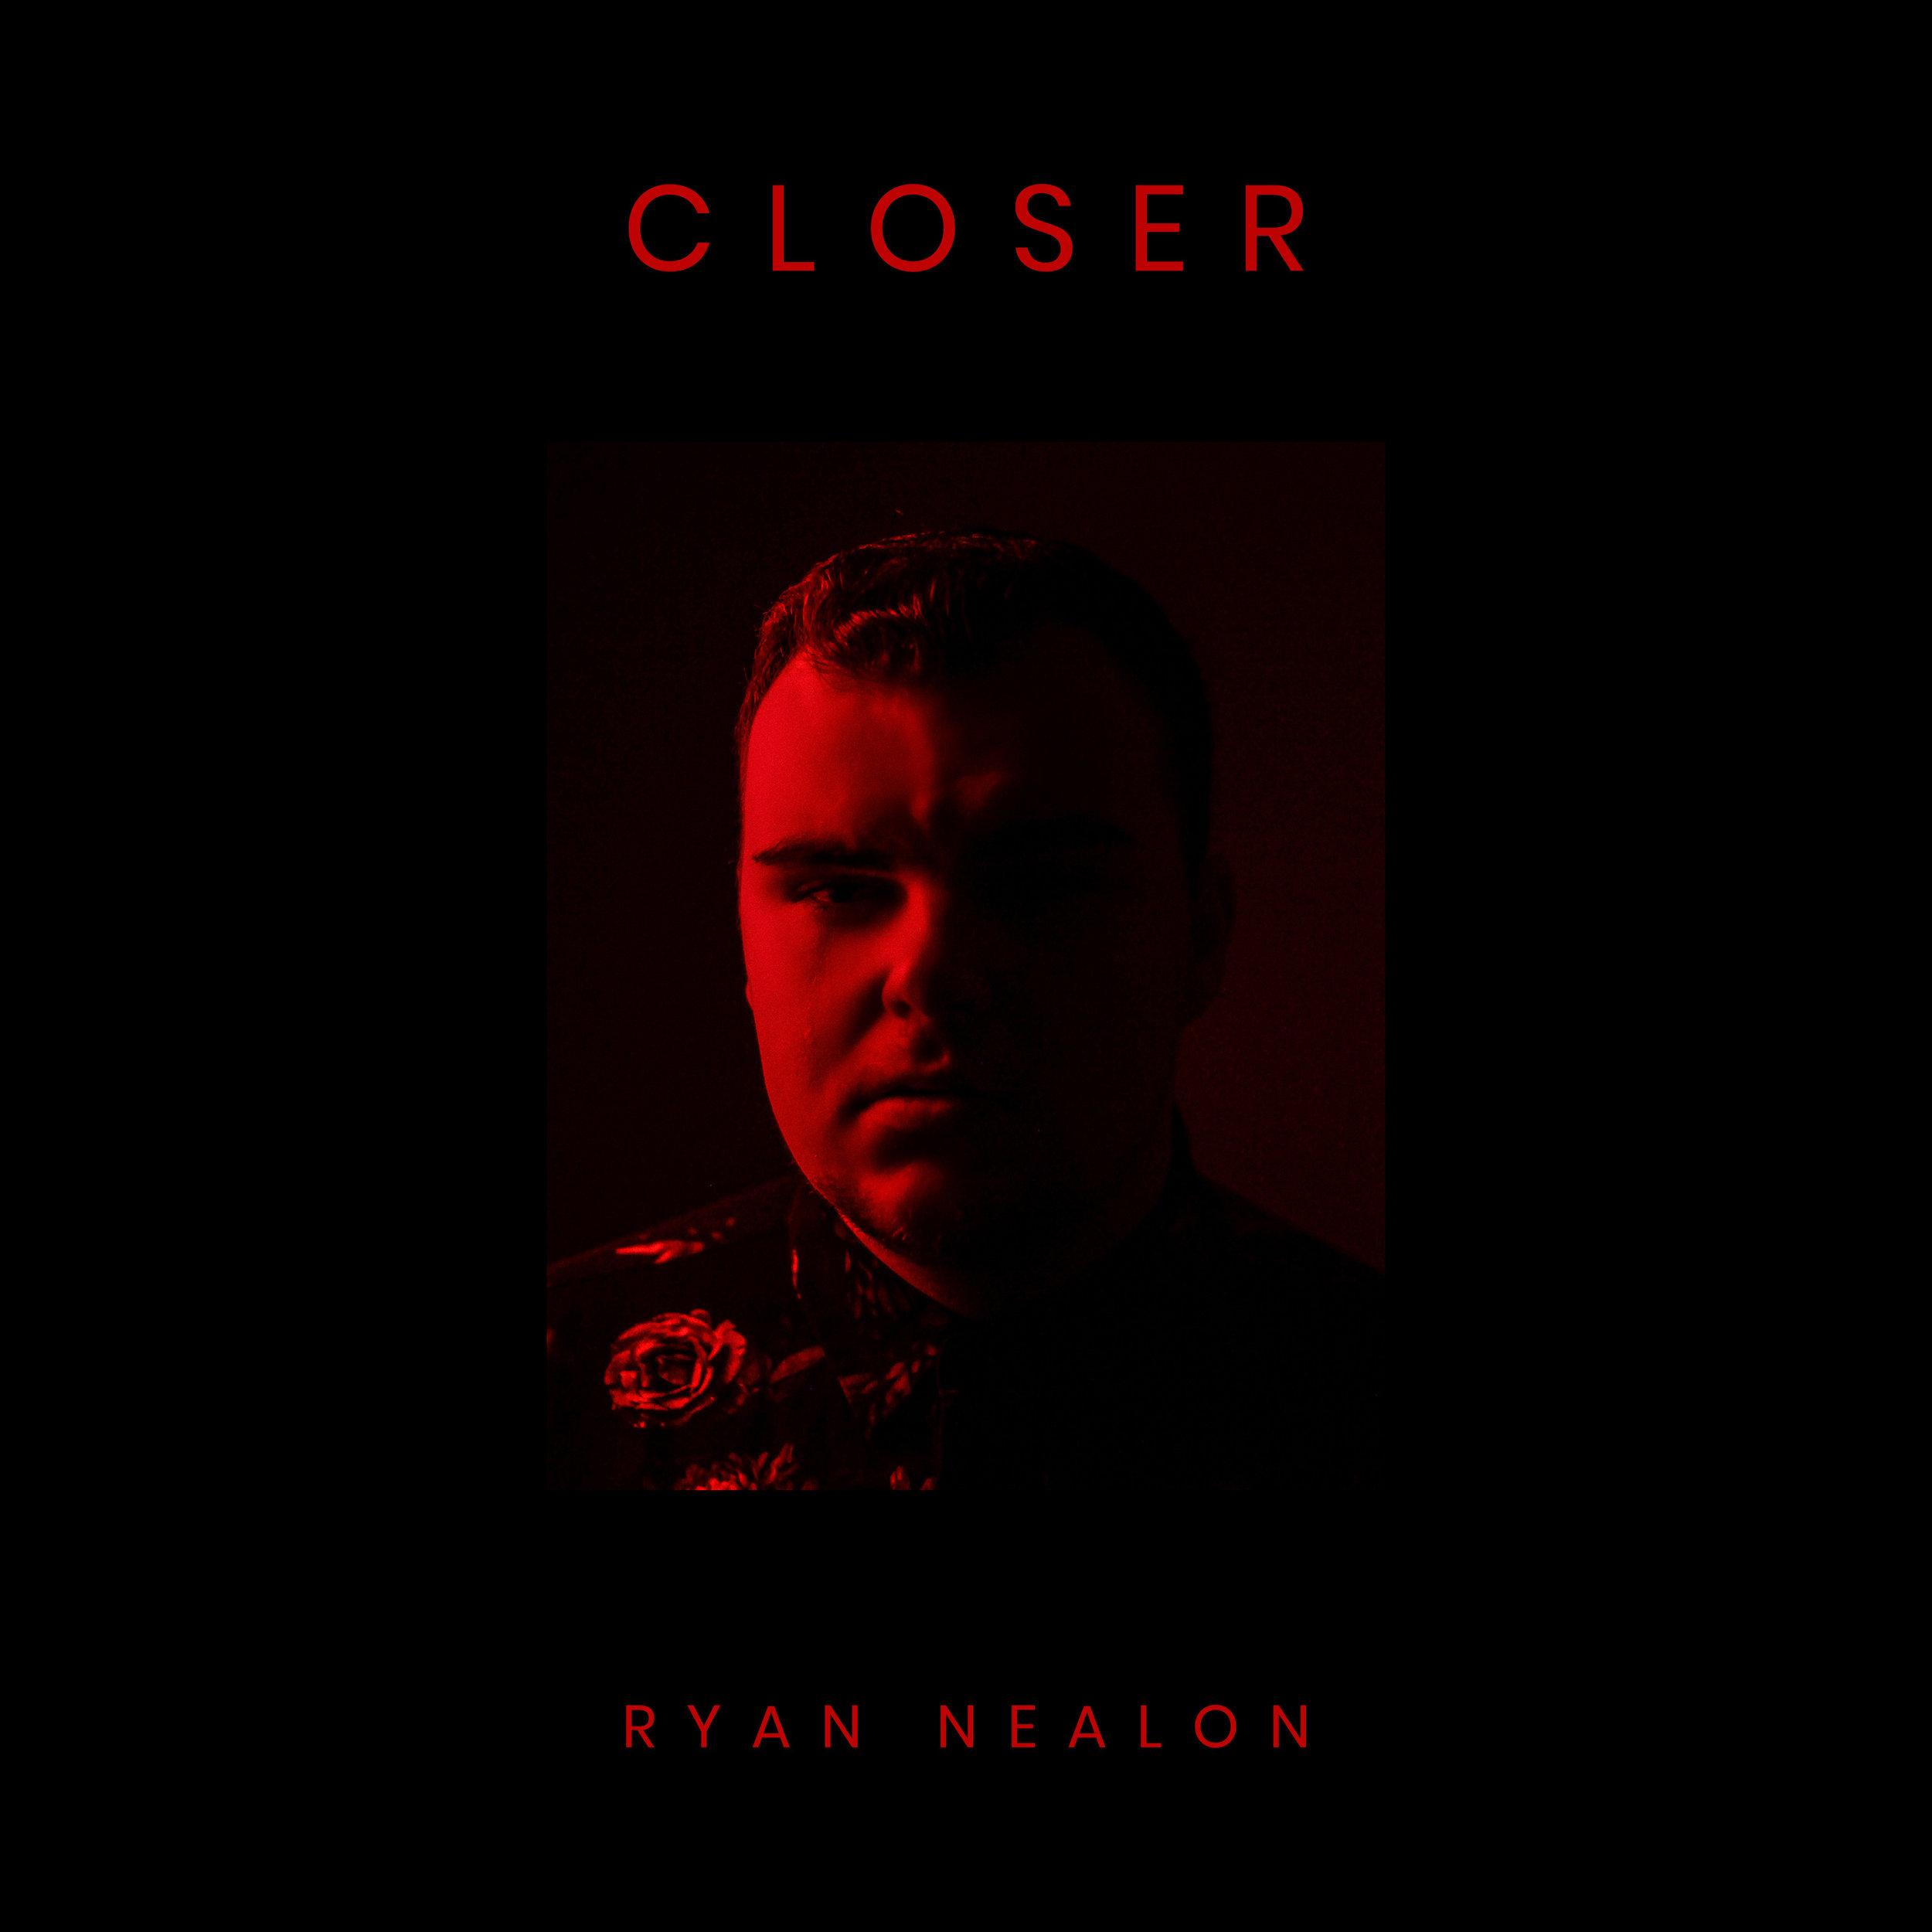 Ryan Nealon - Closer